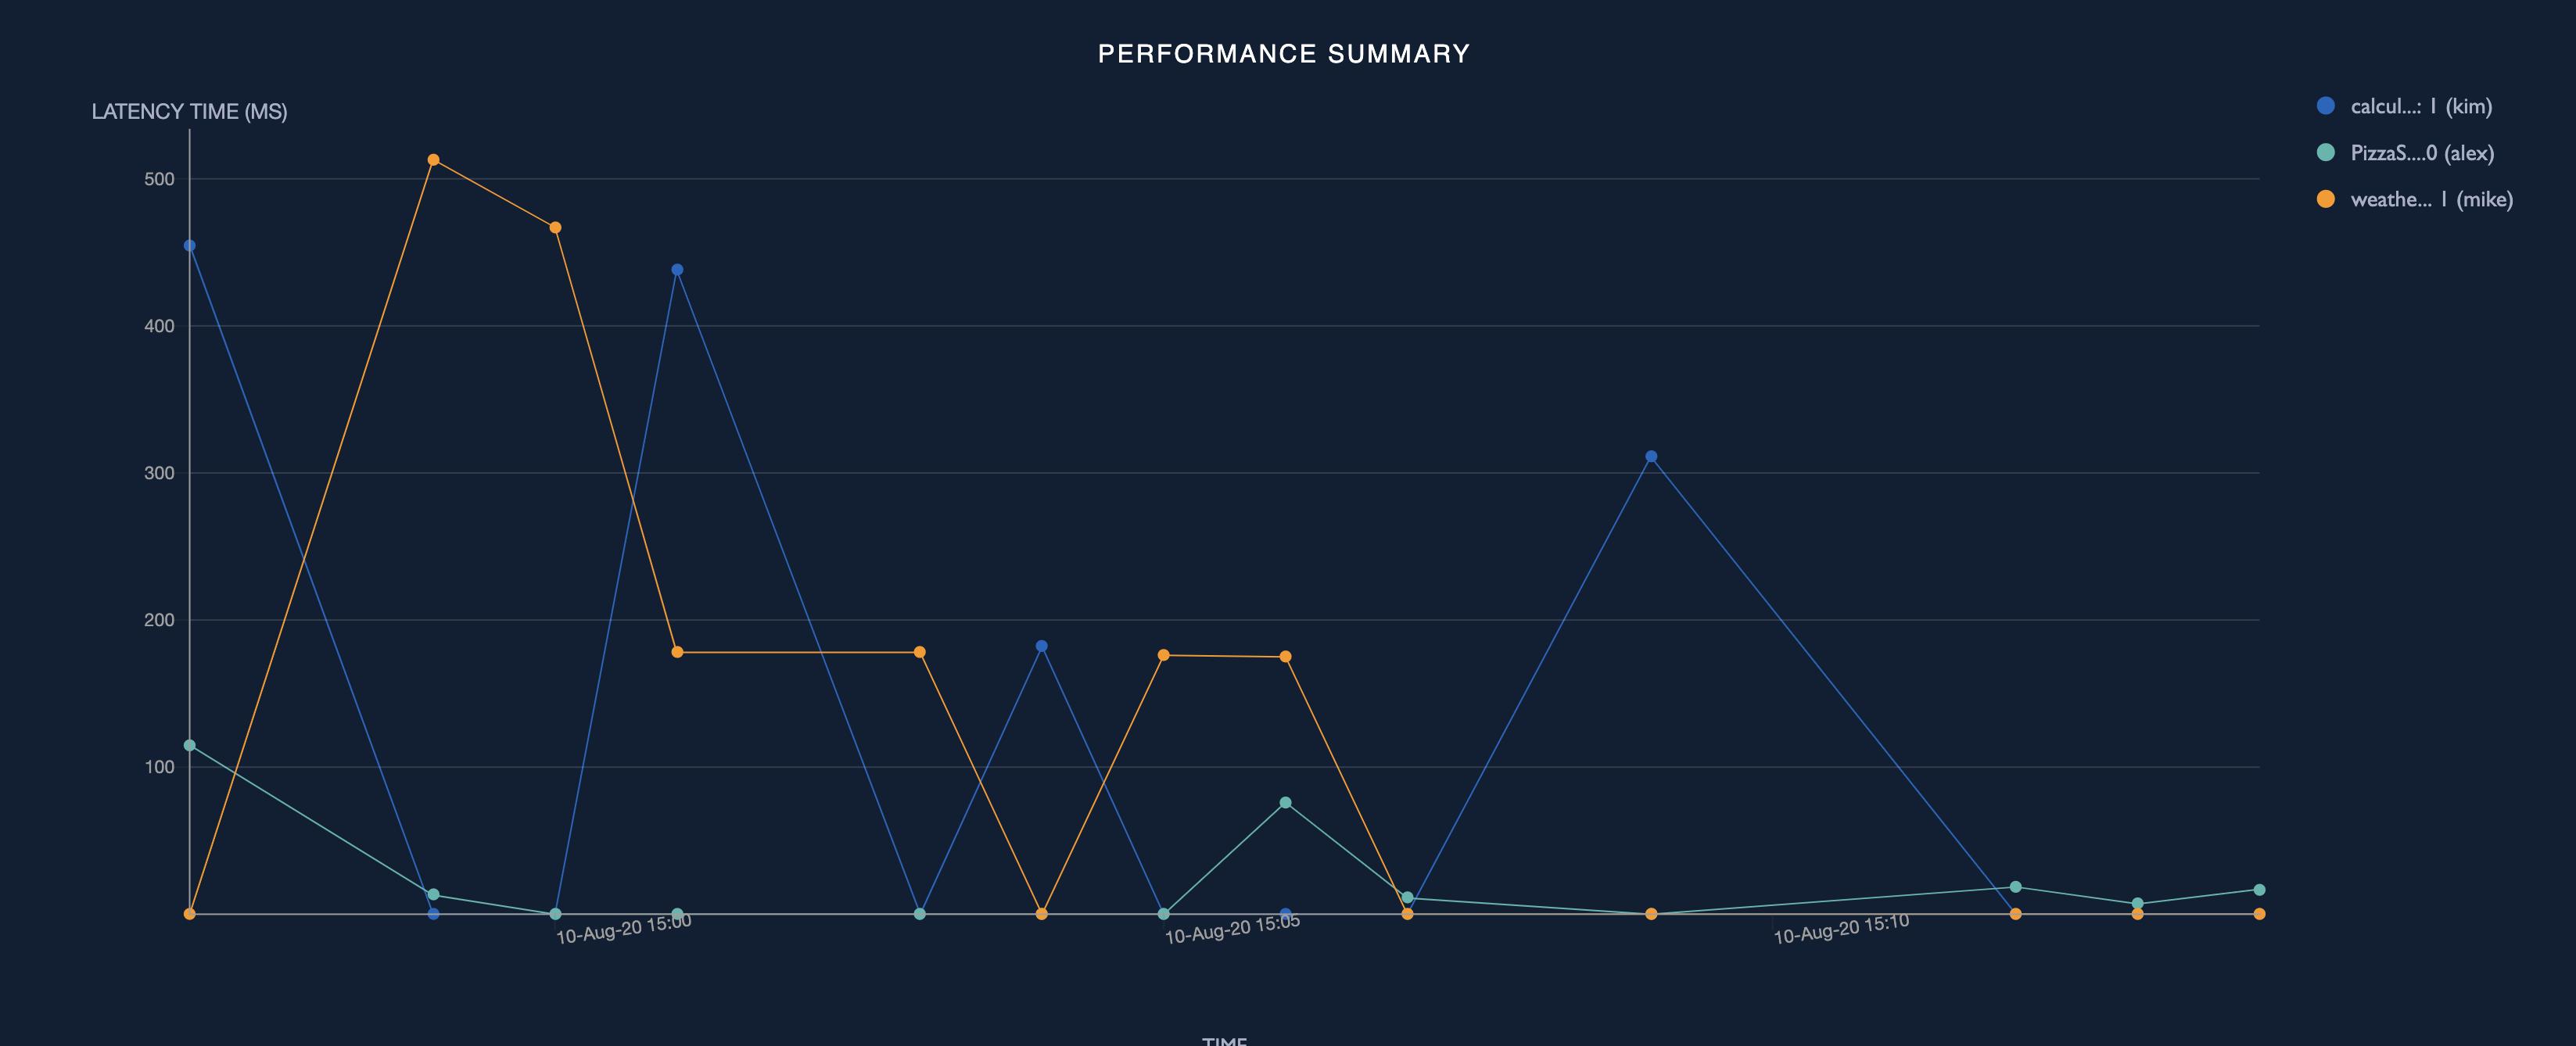 Performance summary